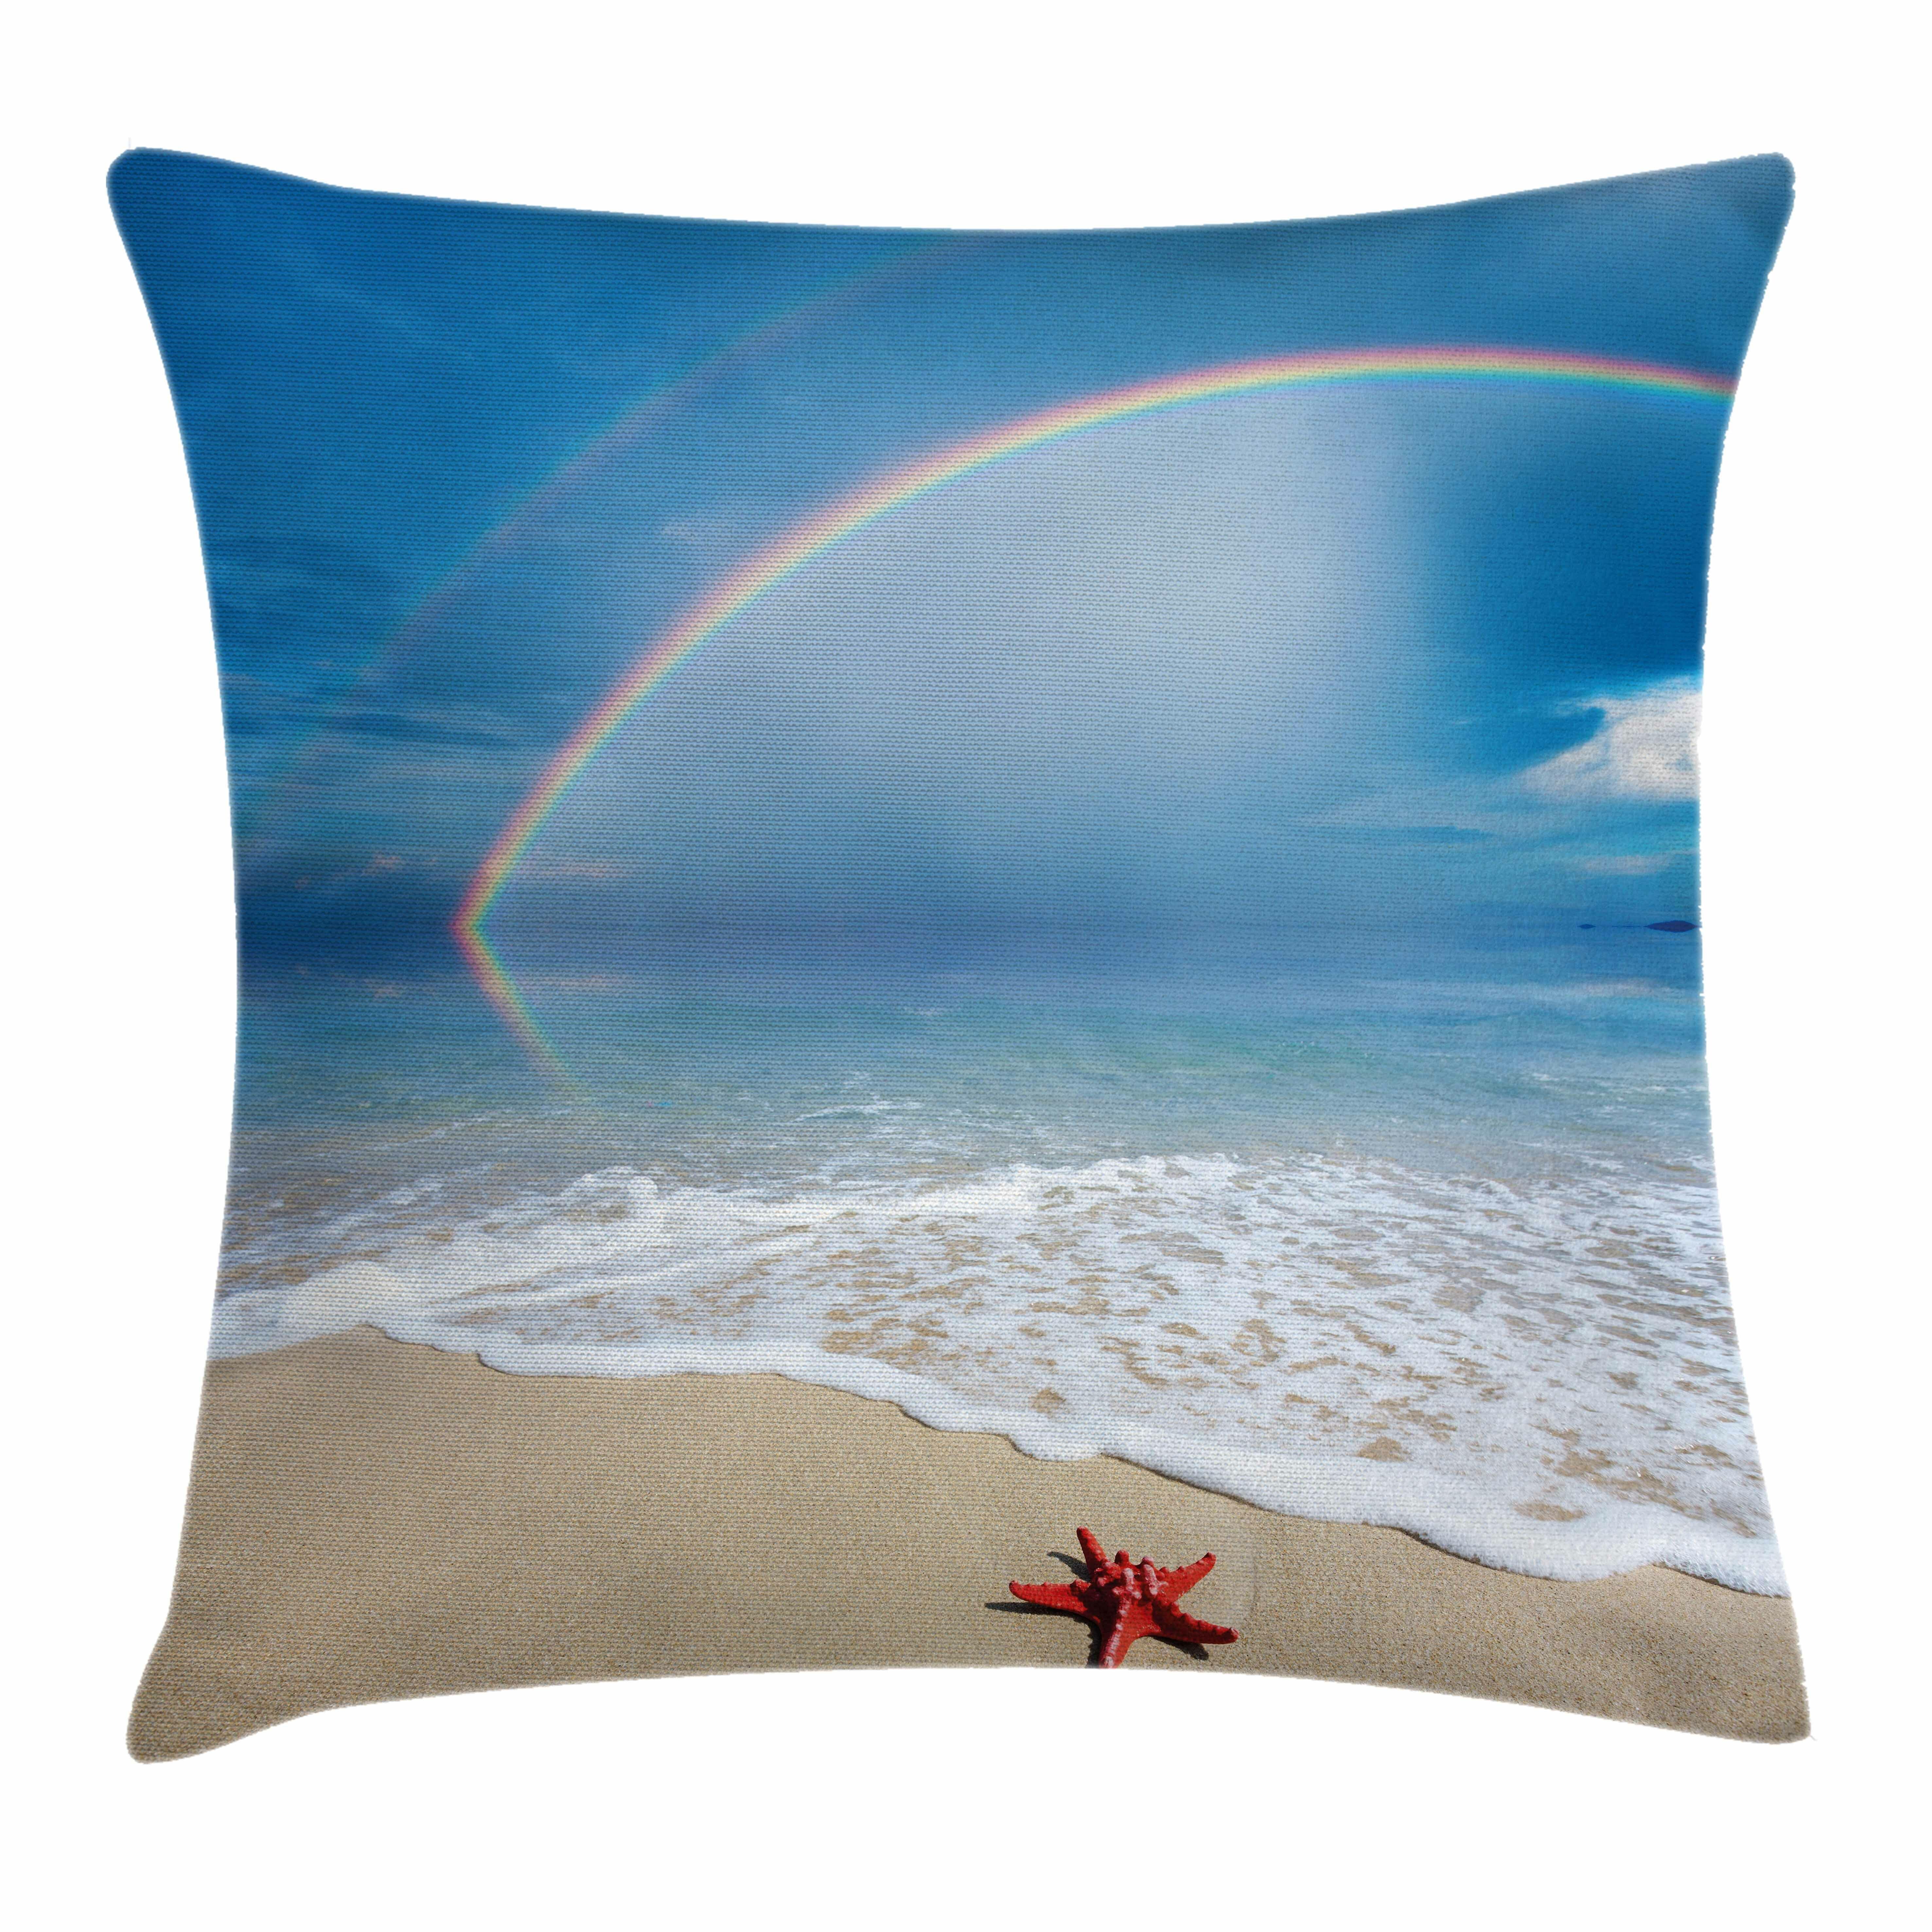 d7c4e804a151 East Urban Home Starfish Decor Rainbow Ocean Square Pillow Cover ...